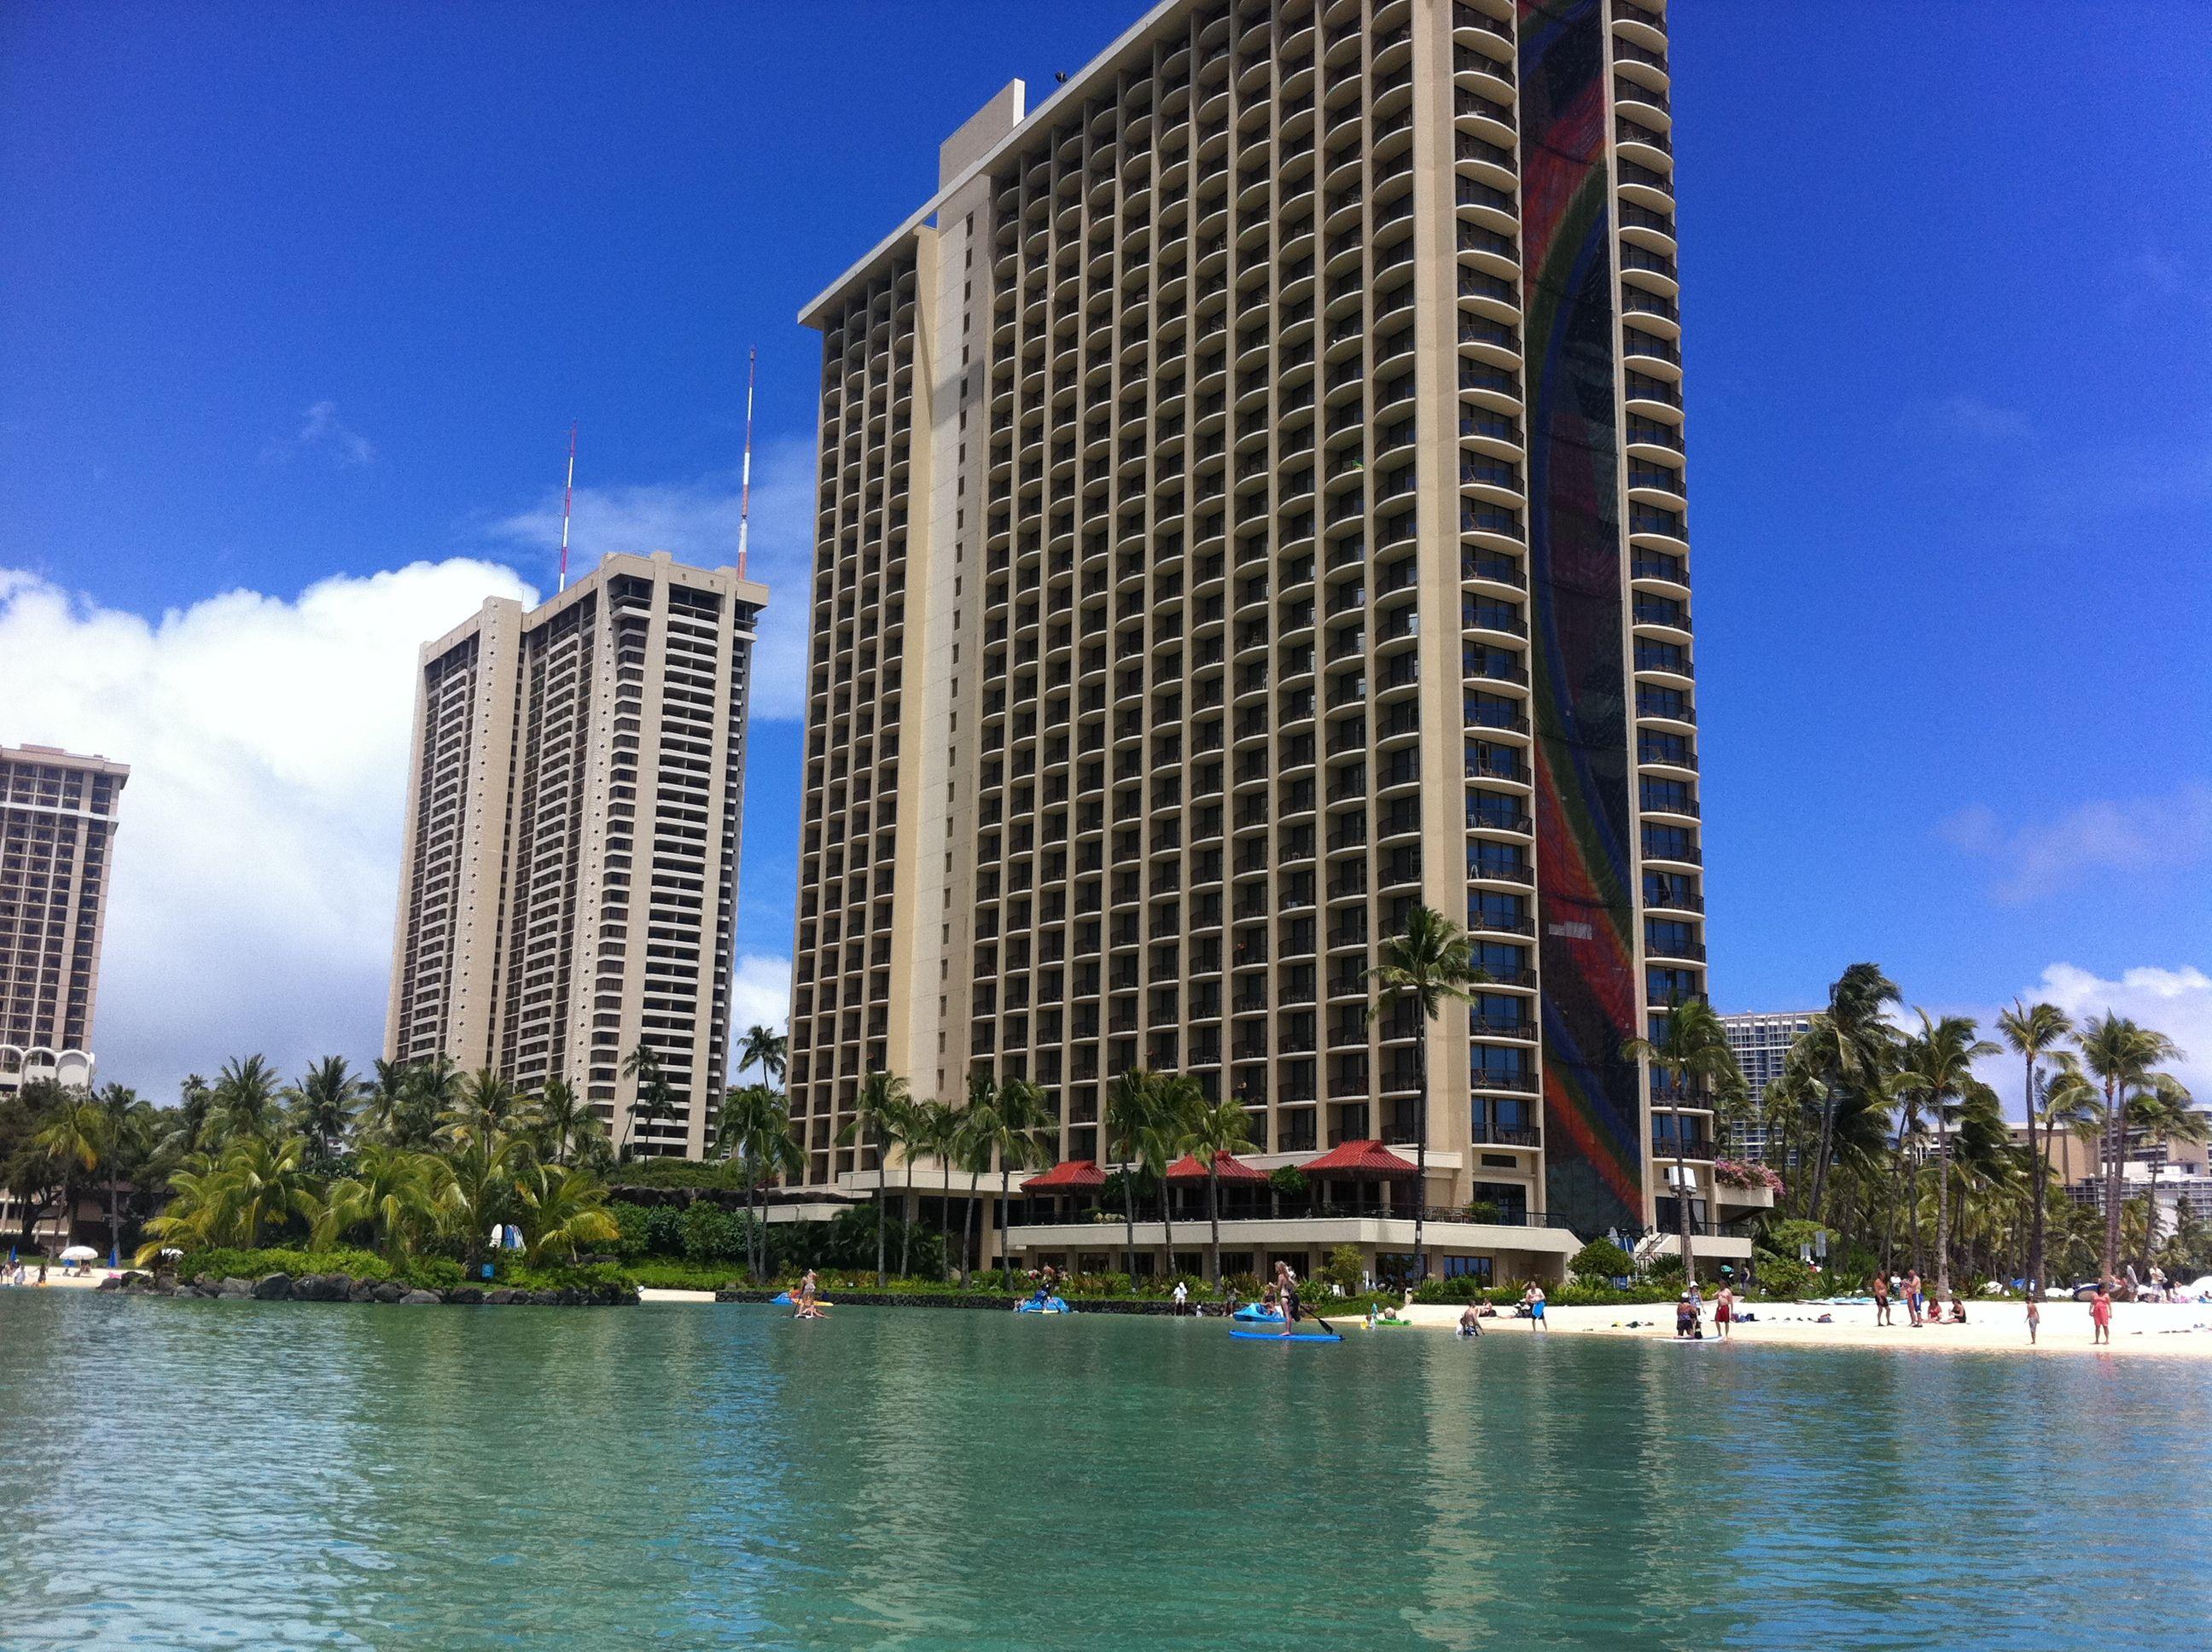 Hilton's Hawaiian Village on Oahu. I took this photo in 2011.